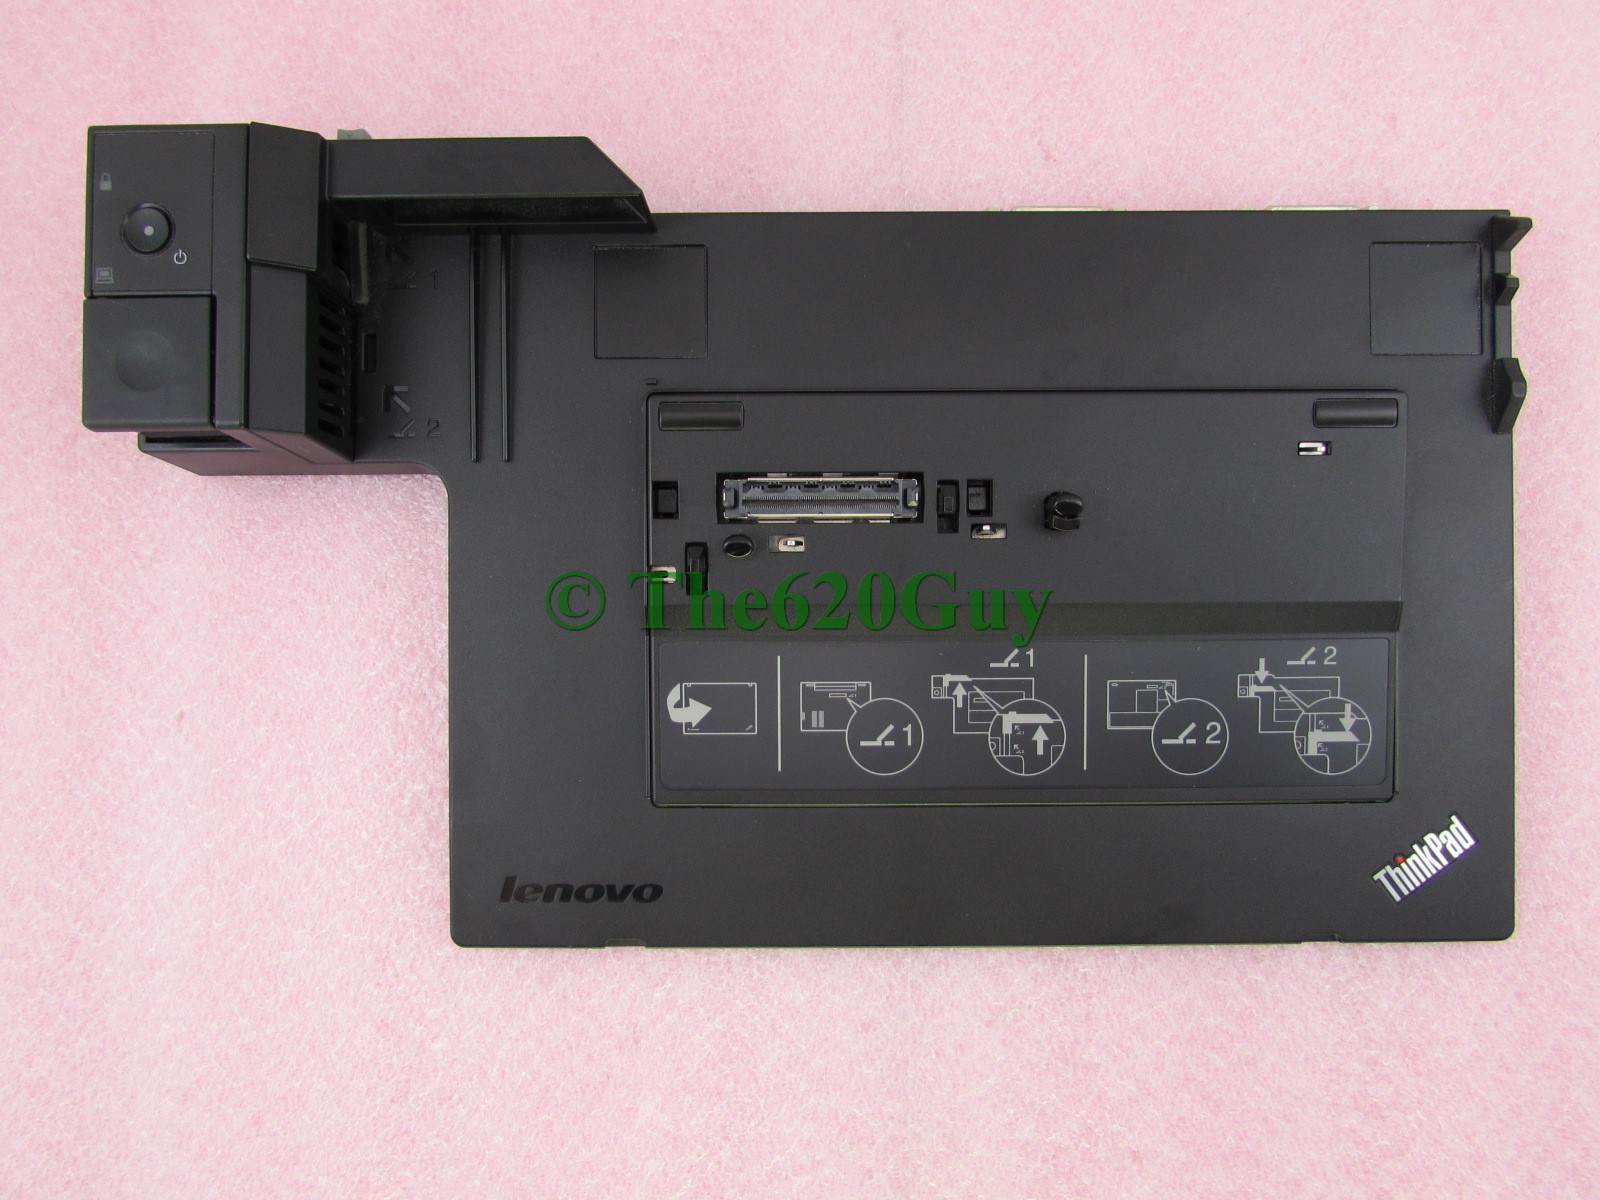 Lenovo ThinkPad 4338 Mini Dock Plus Series 3 Docking Station 45n5888